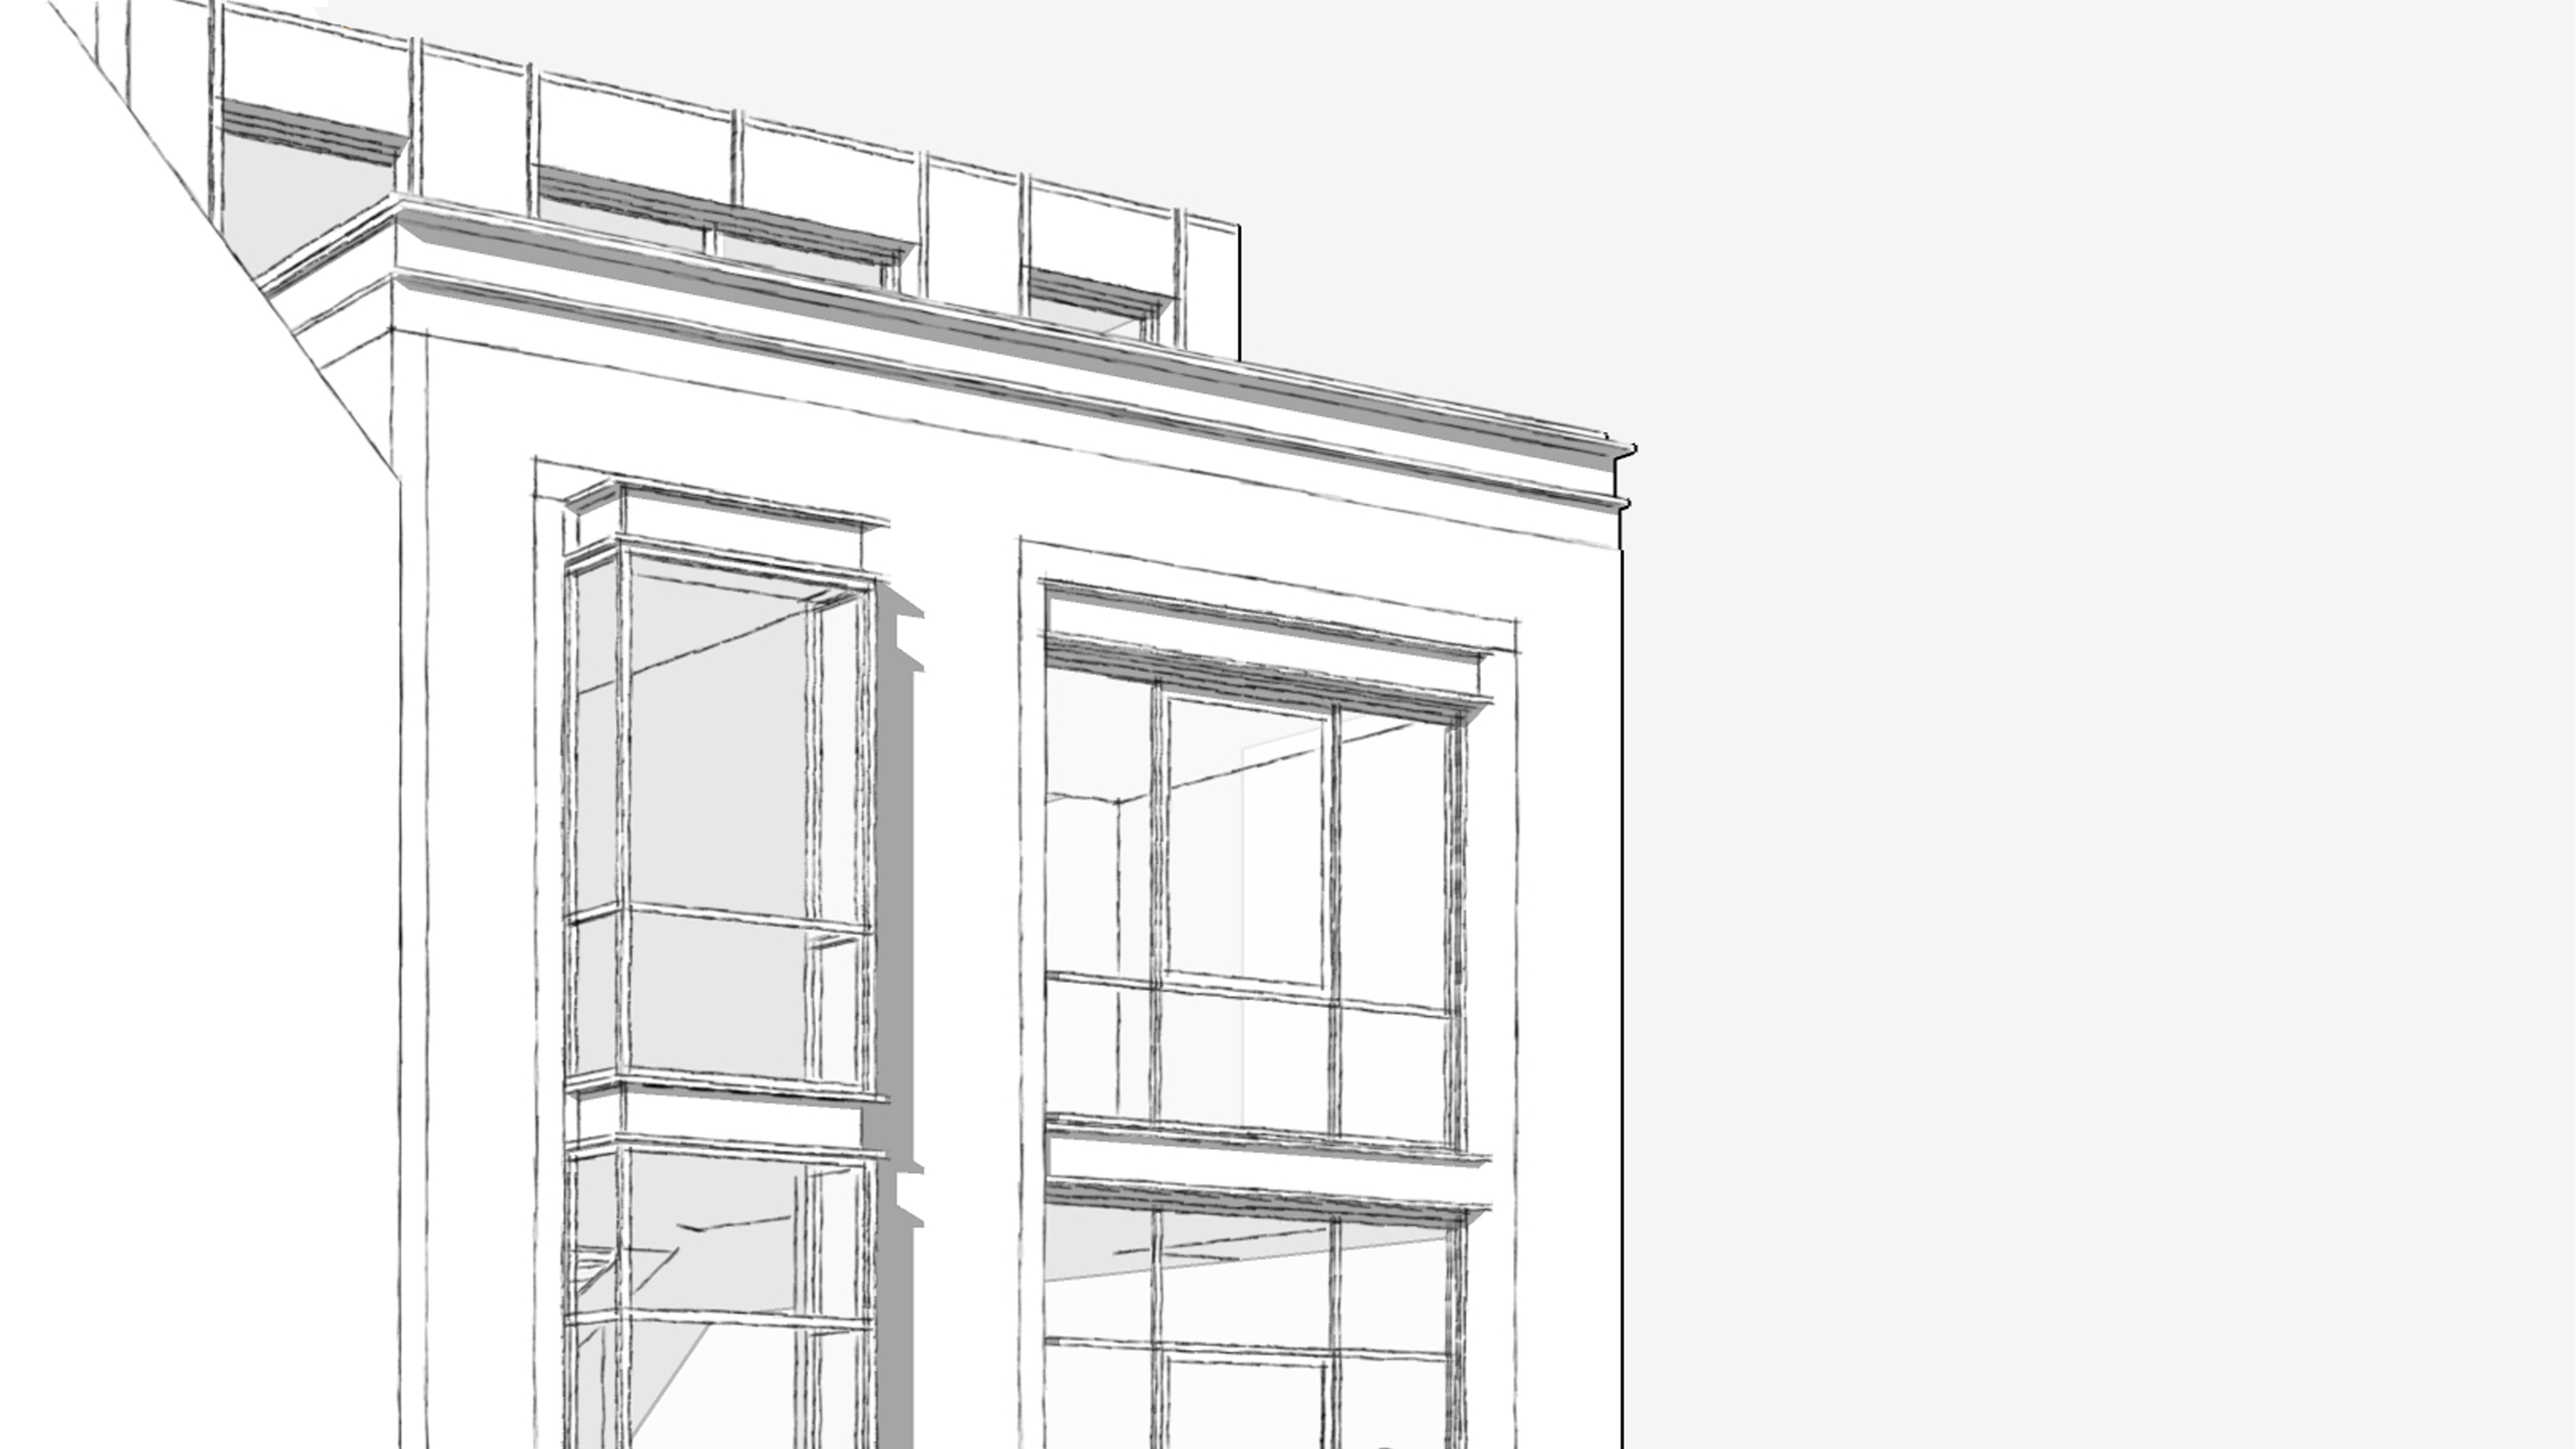 Stijlarchitectuur - Project Stadswerven - Detail tekening